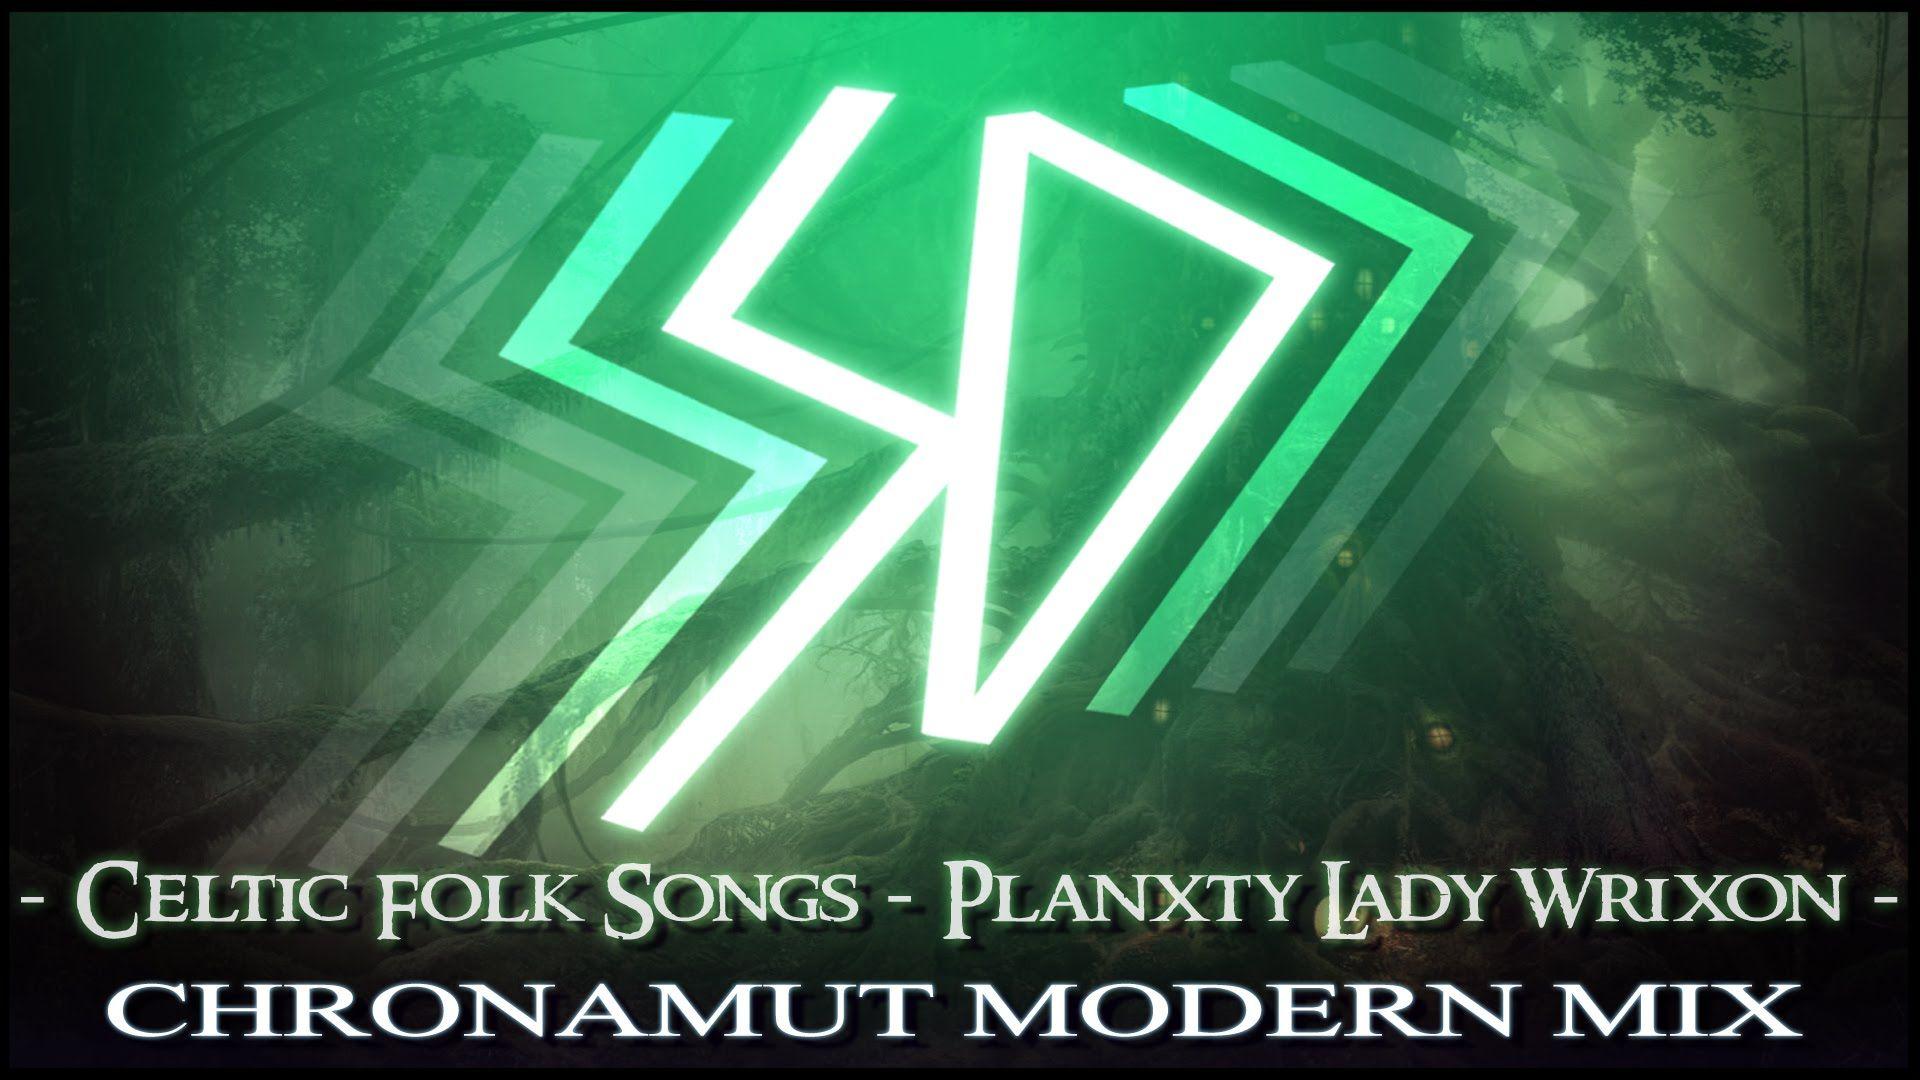 #Chronamut - #Planxty Lady Wrixon ( #Celtic #Folk Mix) http://ShawnDall.com #music #youtube #vgmix #vgremix#gamemusic #shawndall #videogamemusic #newgrounds #ocremix #brawl #mix #remix #cover #original #ambient #classical #rock #electro #edm #electronic #song